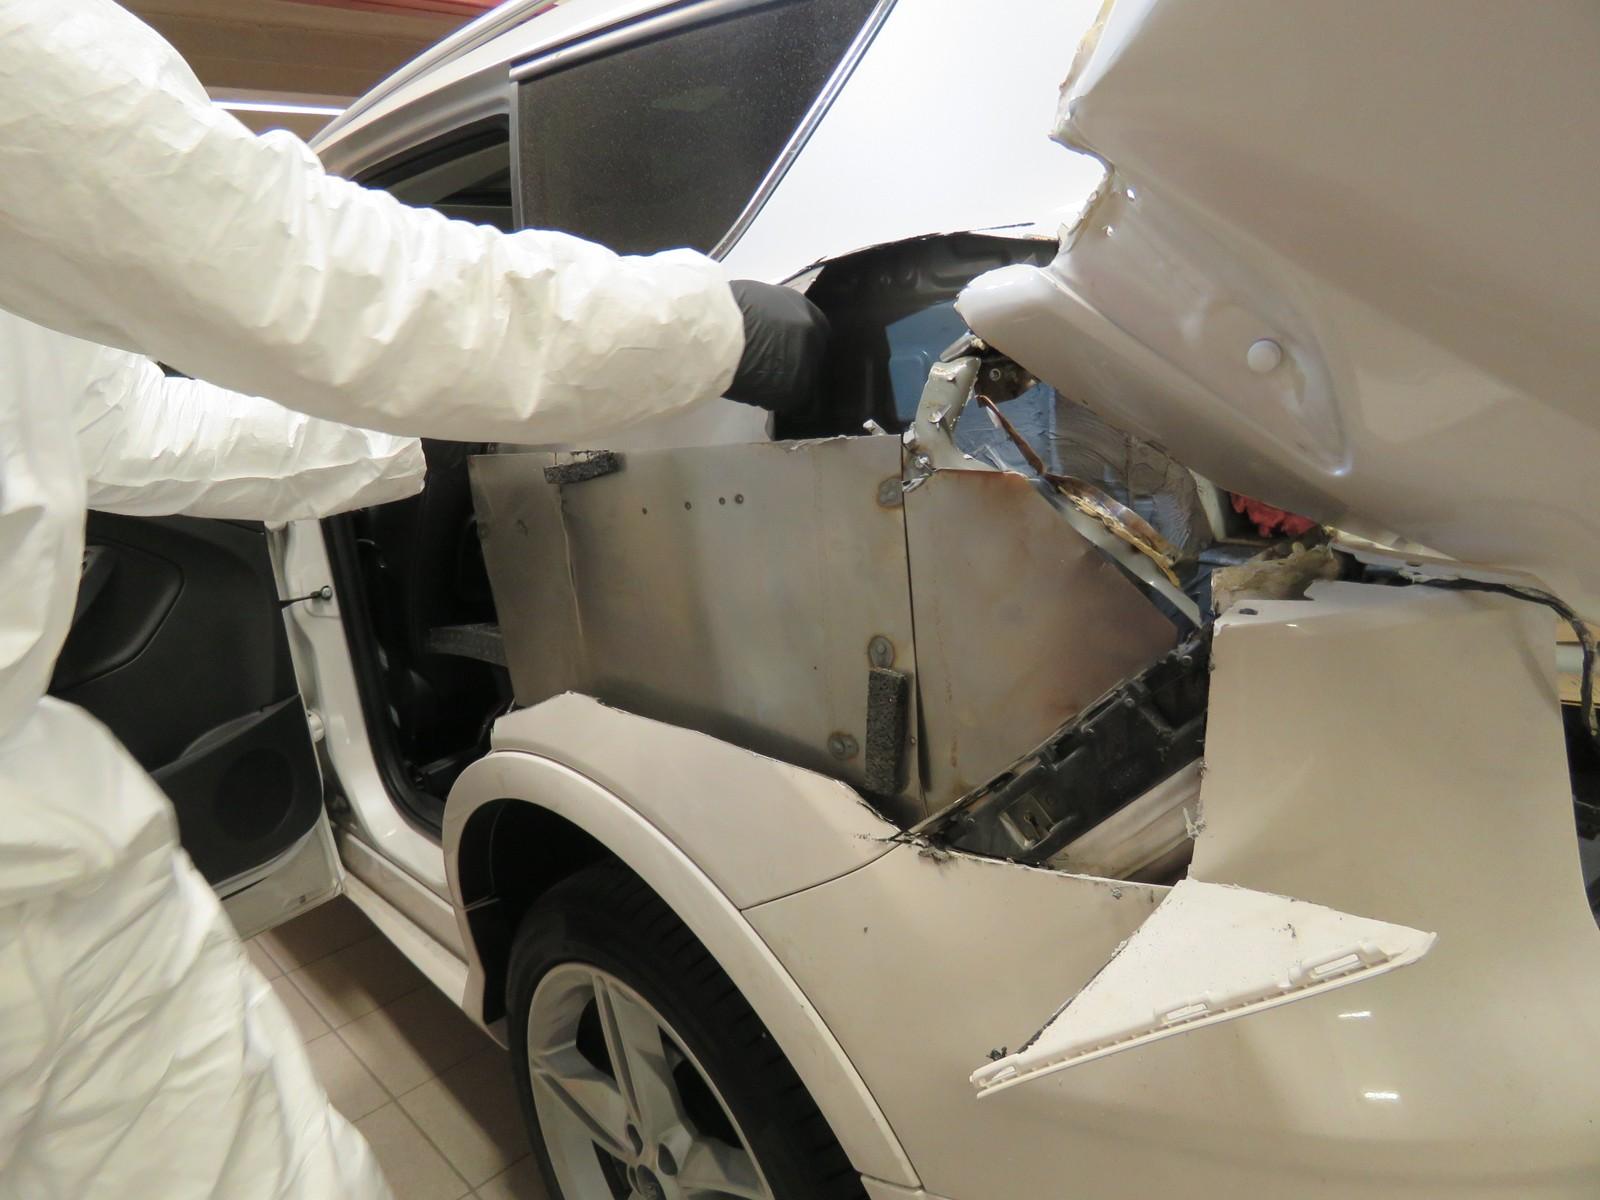 Her plukker tollerne ut narkotika fra bilens karosseri.